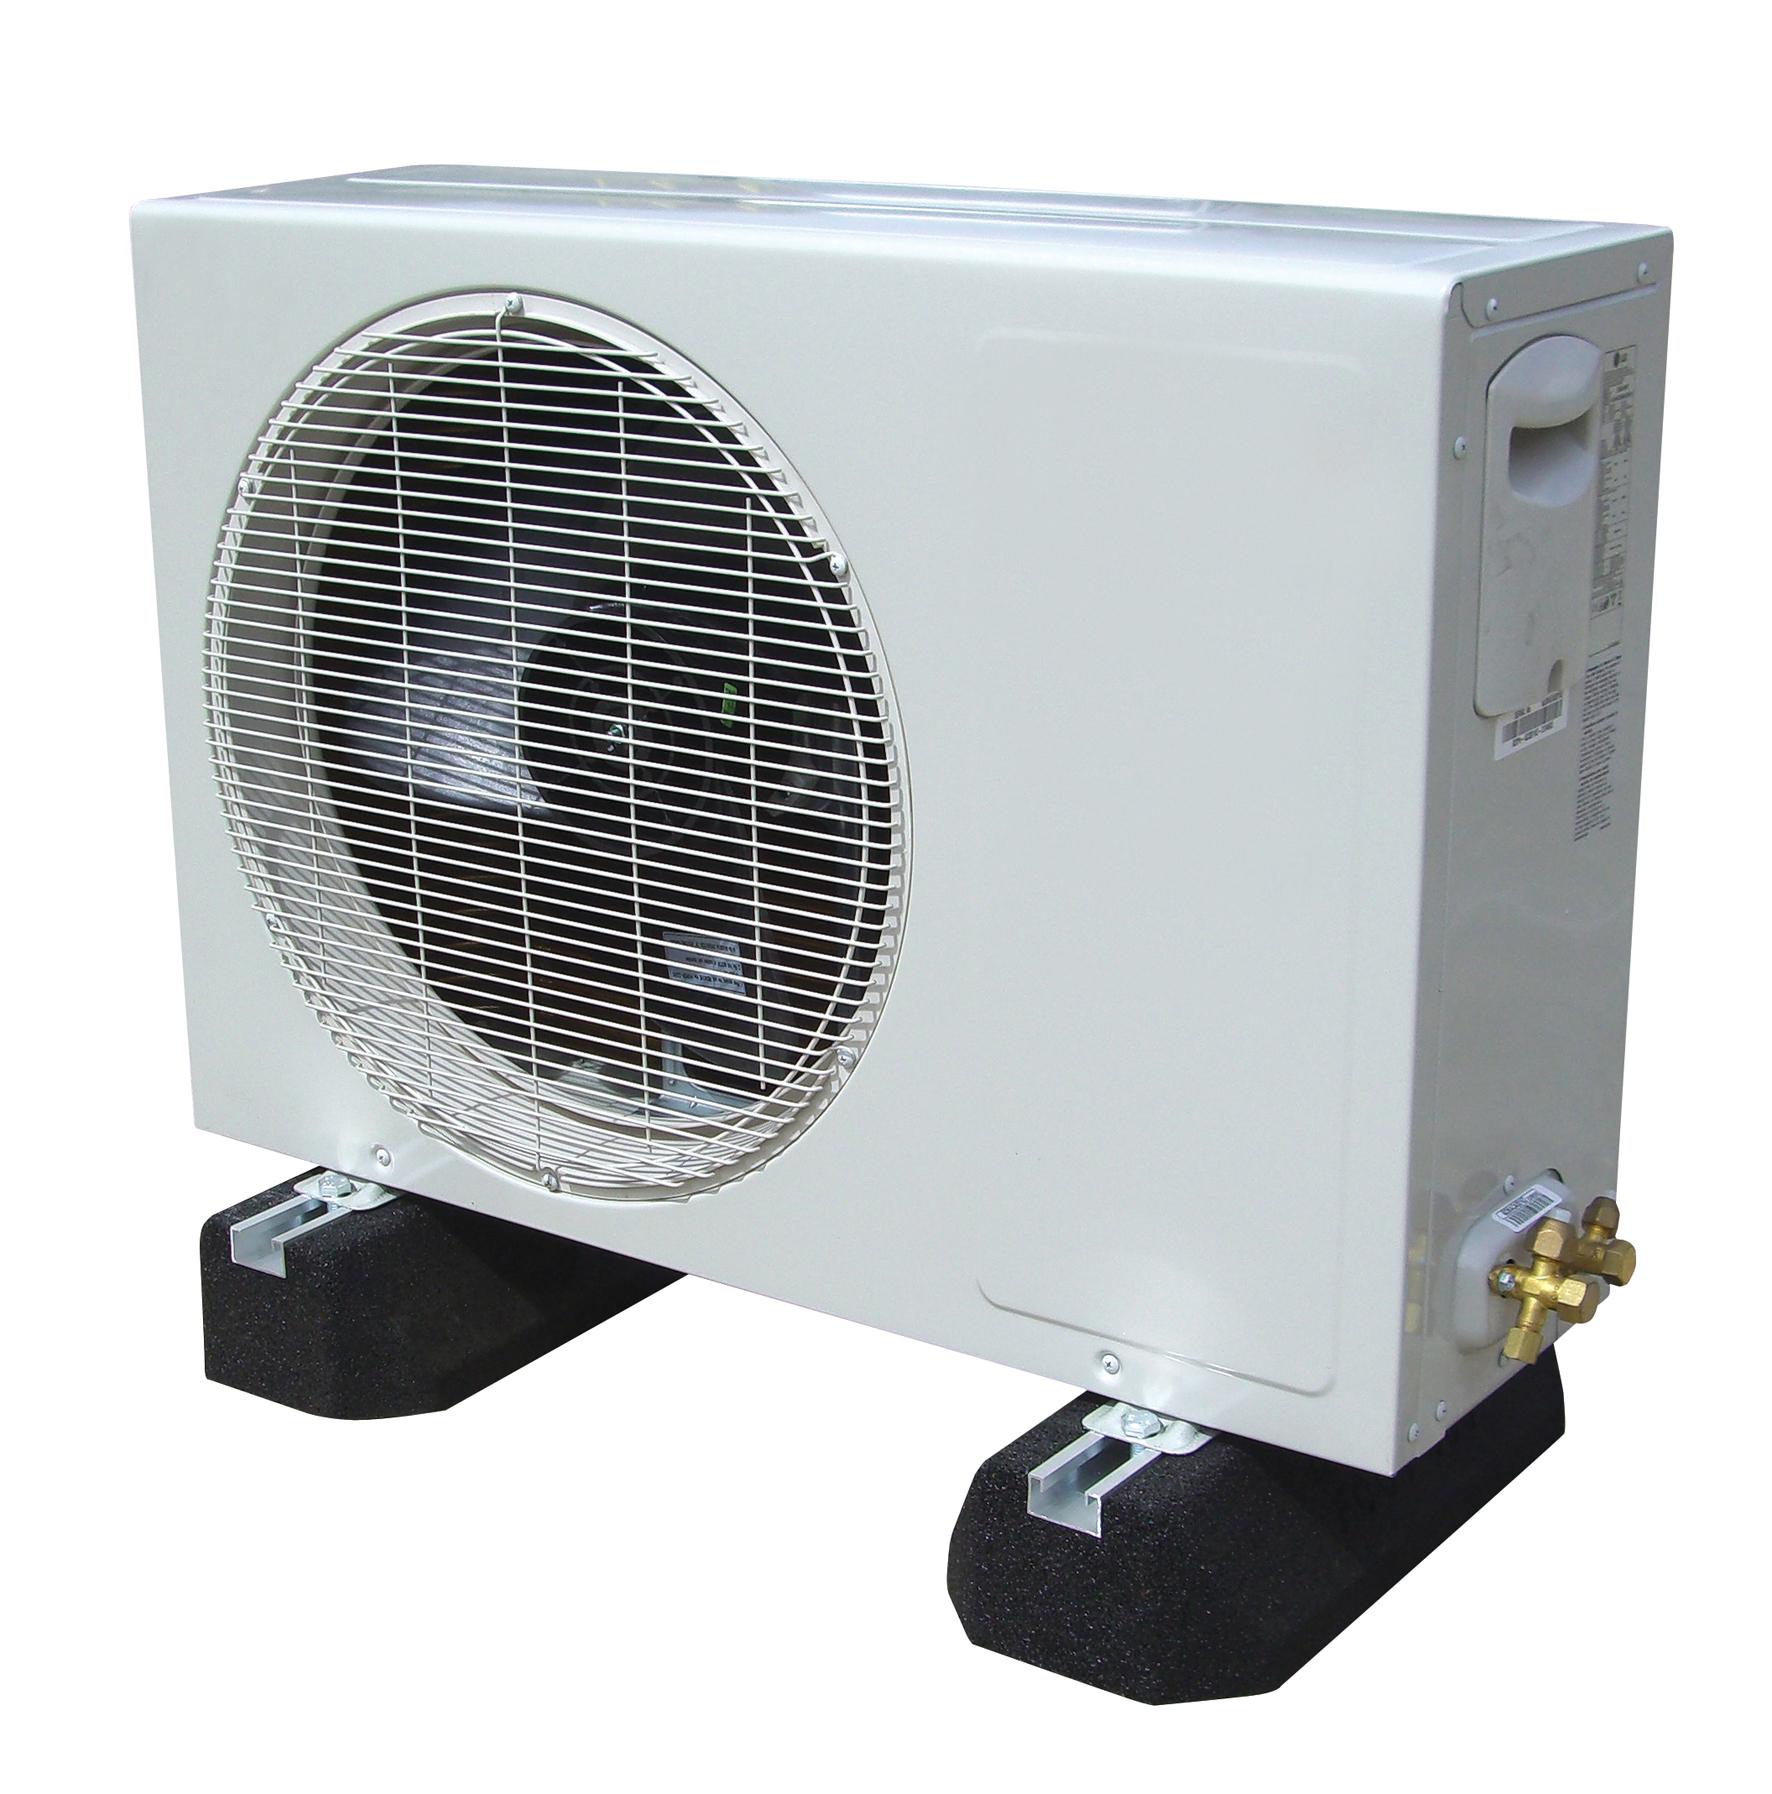 Gerätefuß für Klimaaußengeräte oder Wärmepumpen